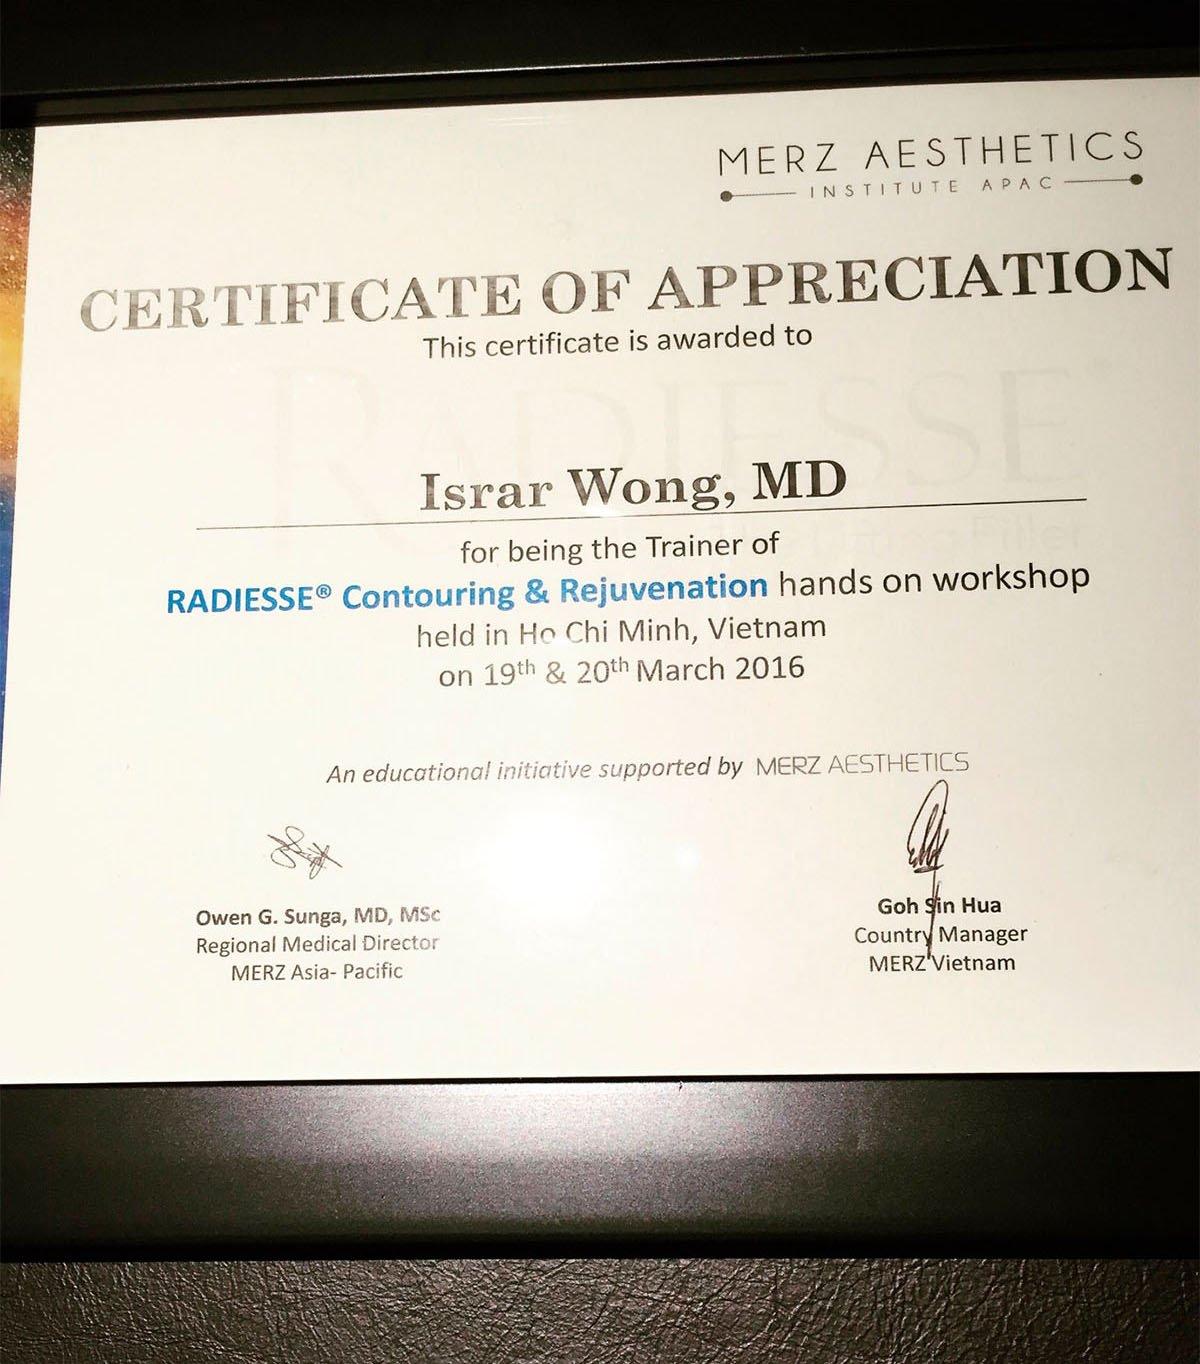 Certificate Merz Aesthetics APAC